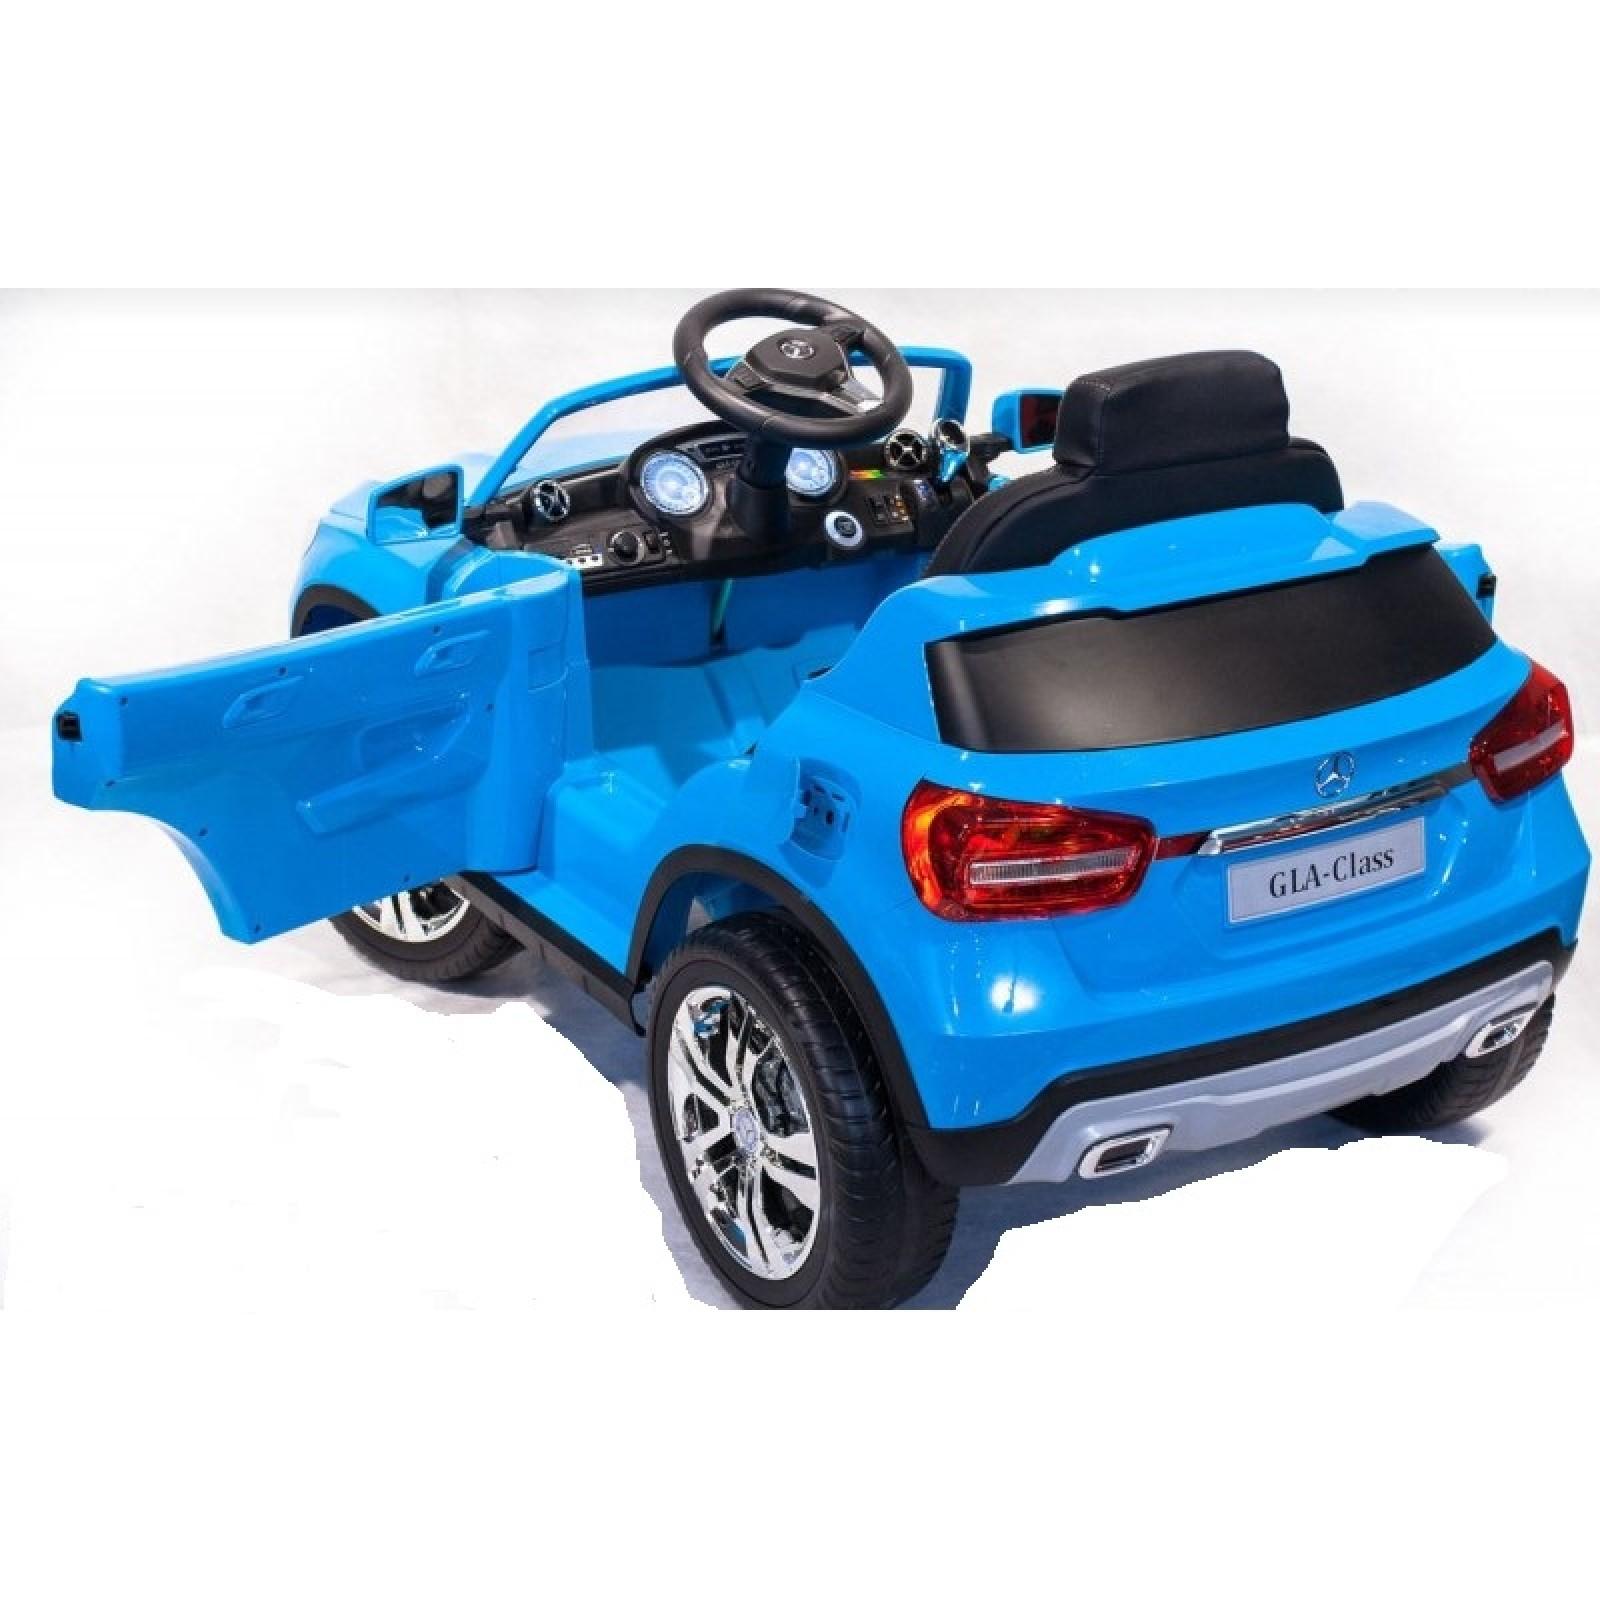 Детский электромобиль BARTY Mercedes-Benz GLACLASS